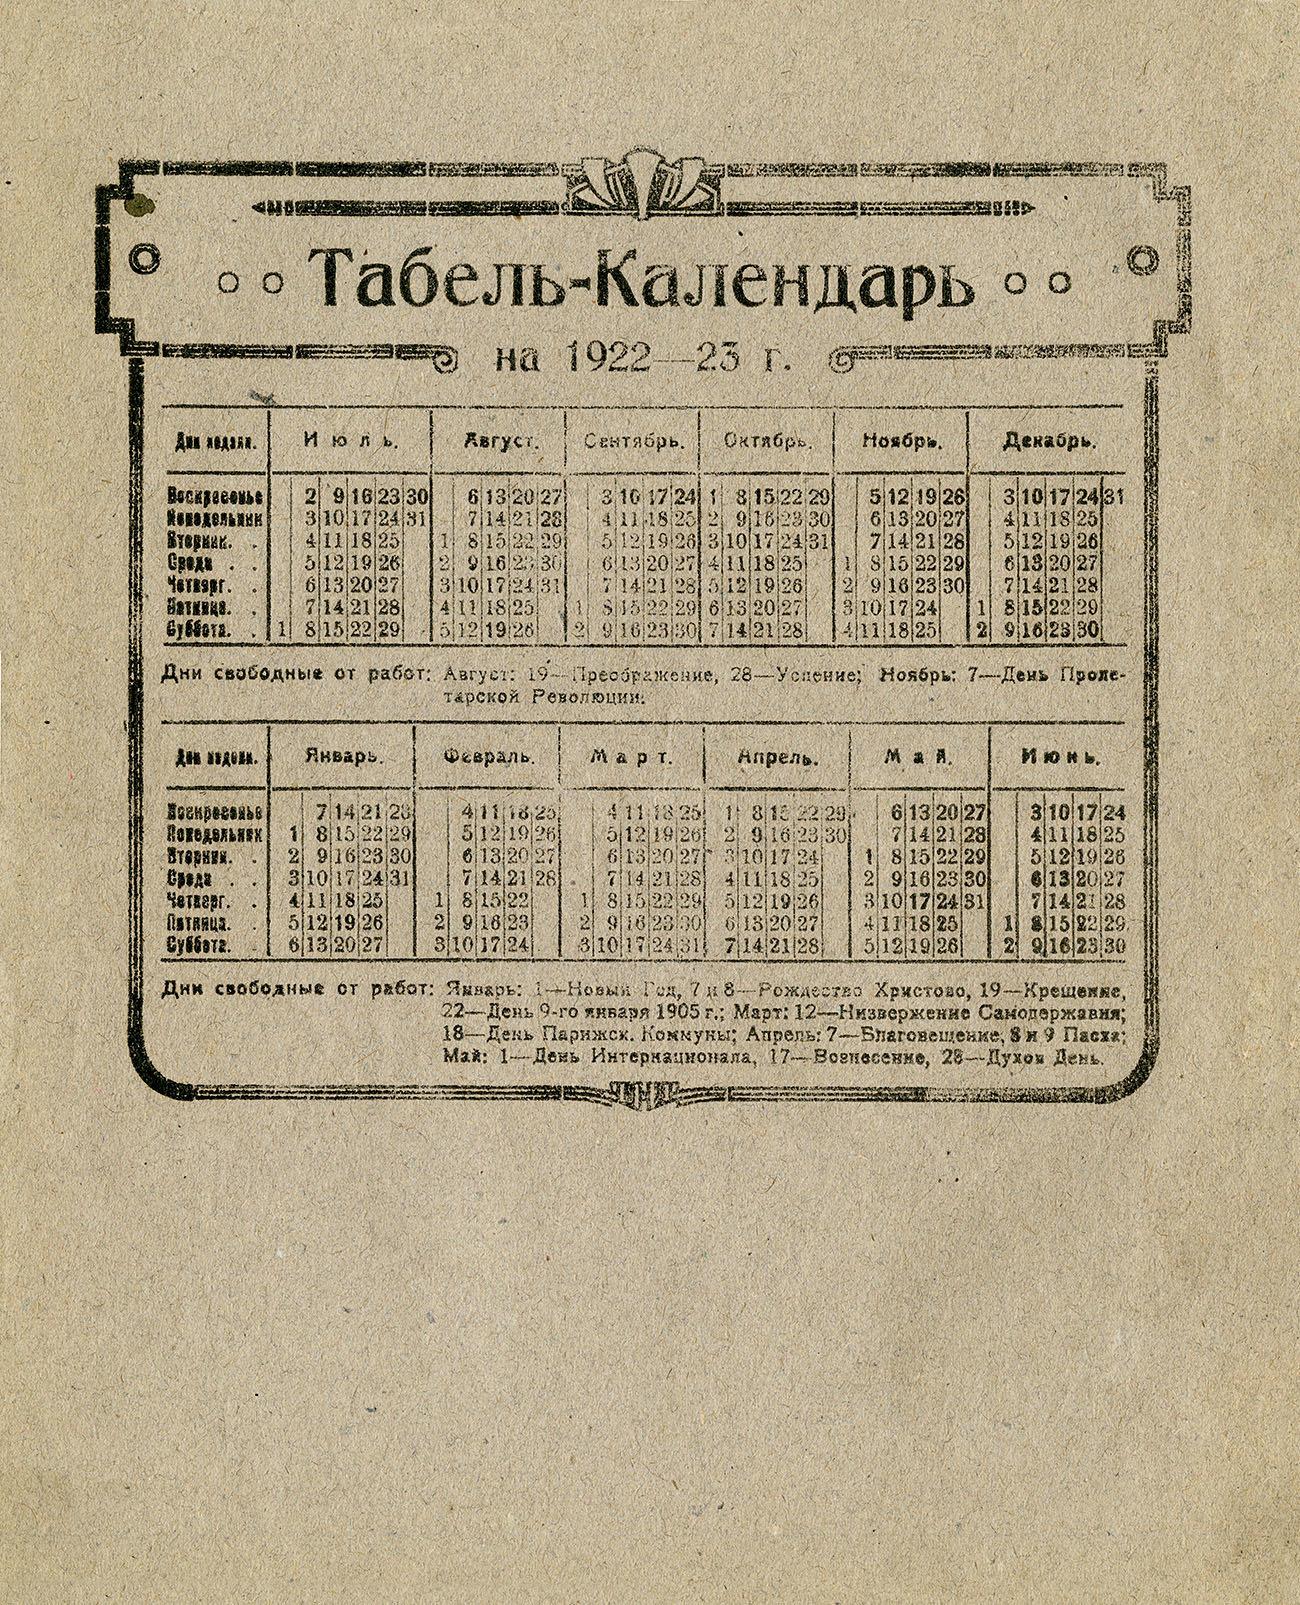 Пушкин 1922-23 оборот